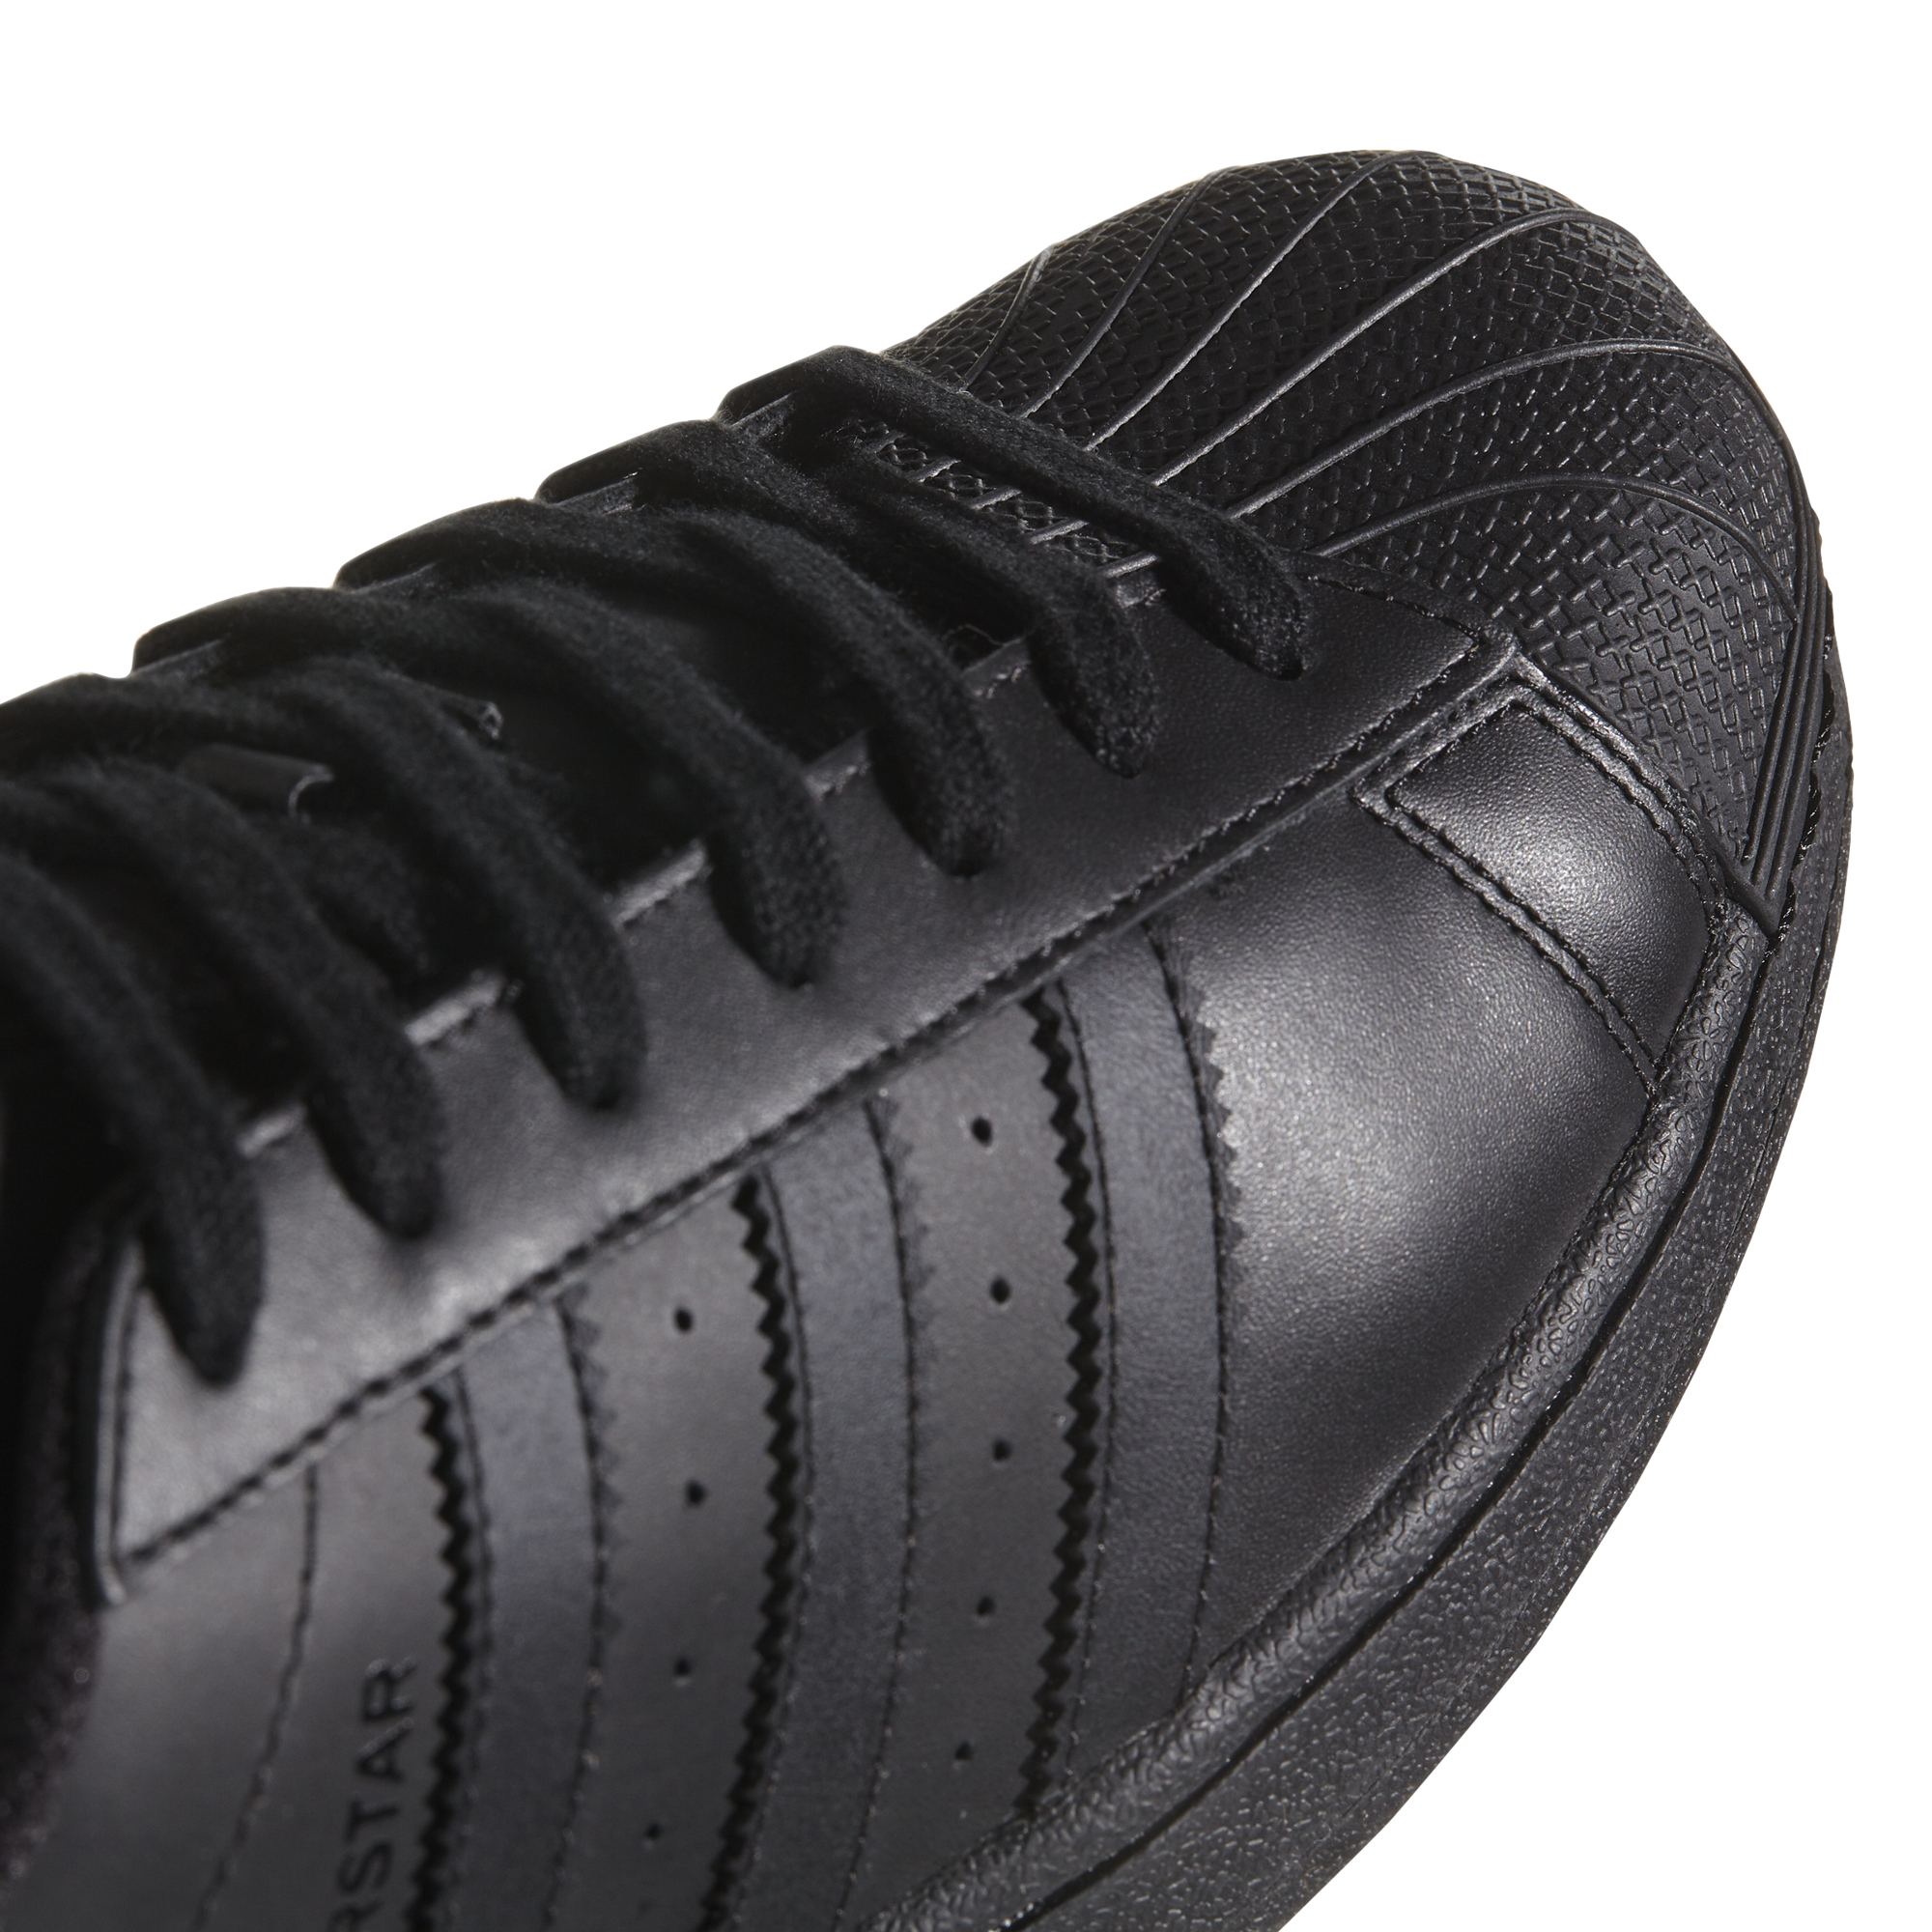 Buty adidas Superstar Foundation AF5666 CblackCblackCblack